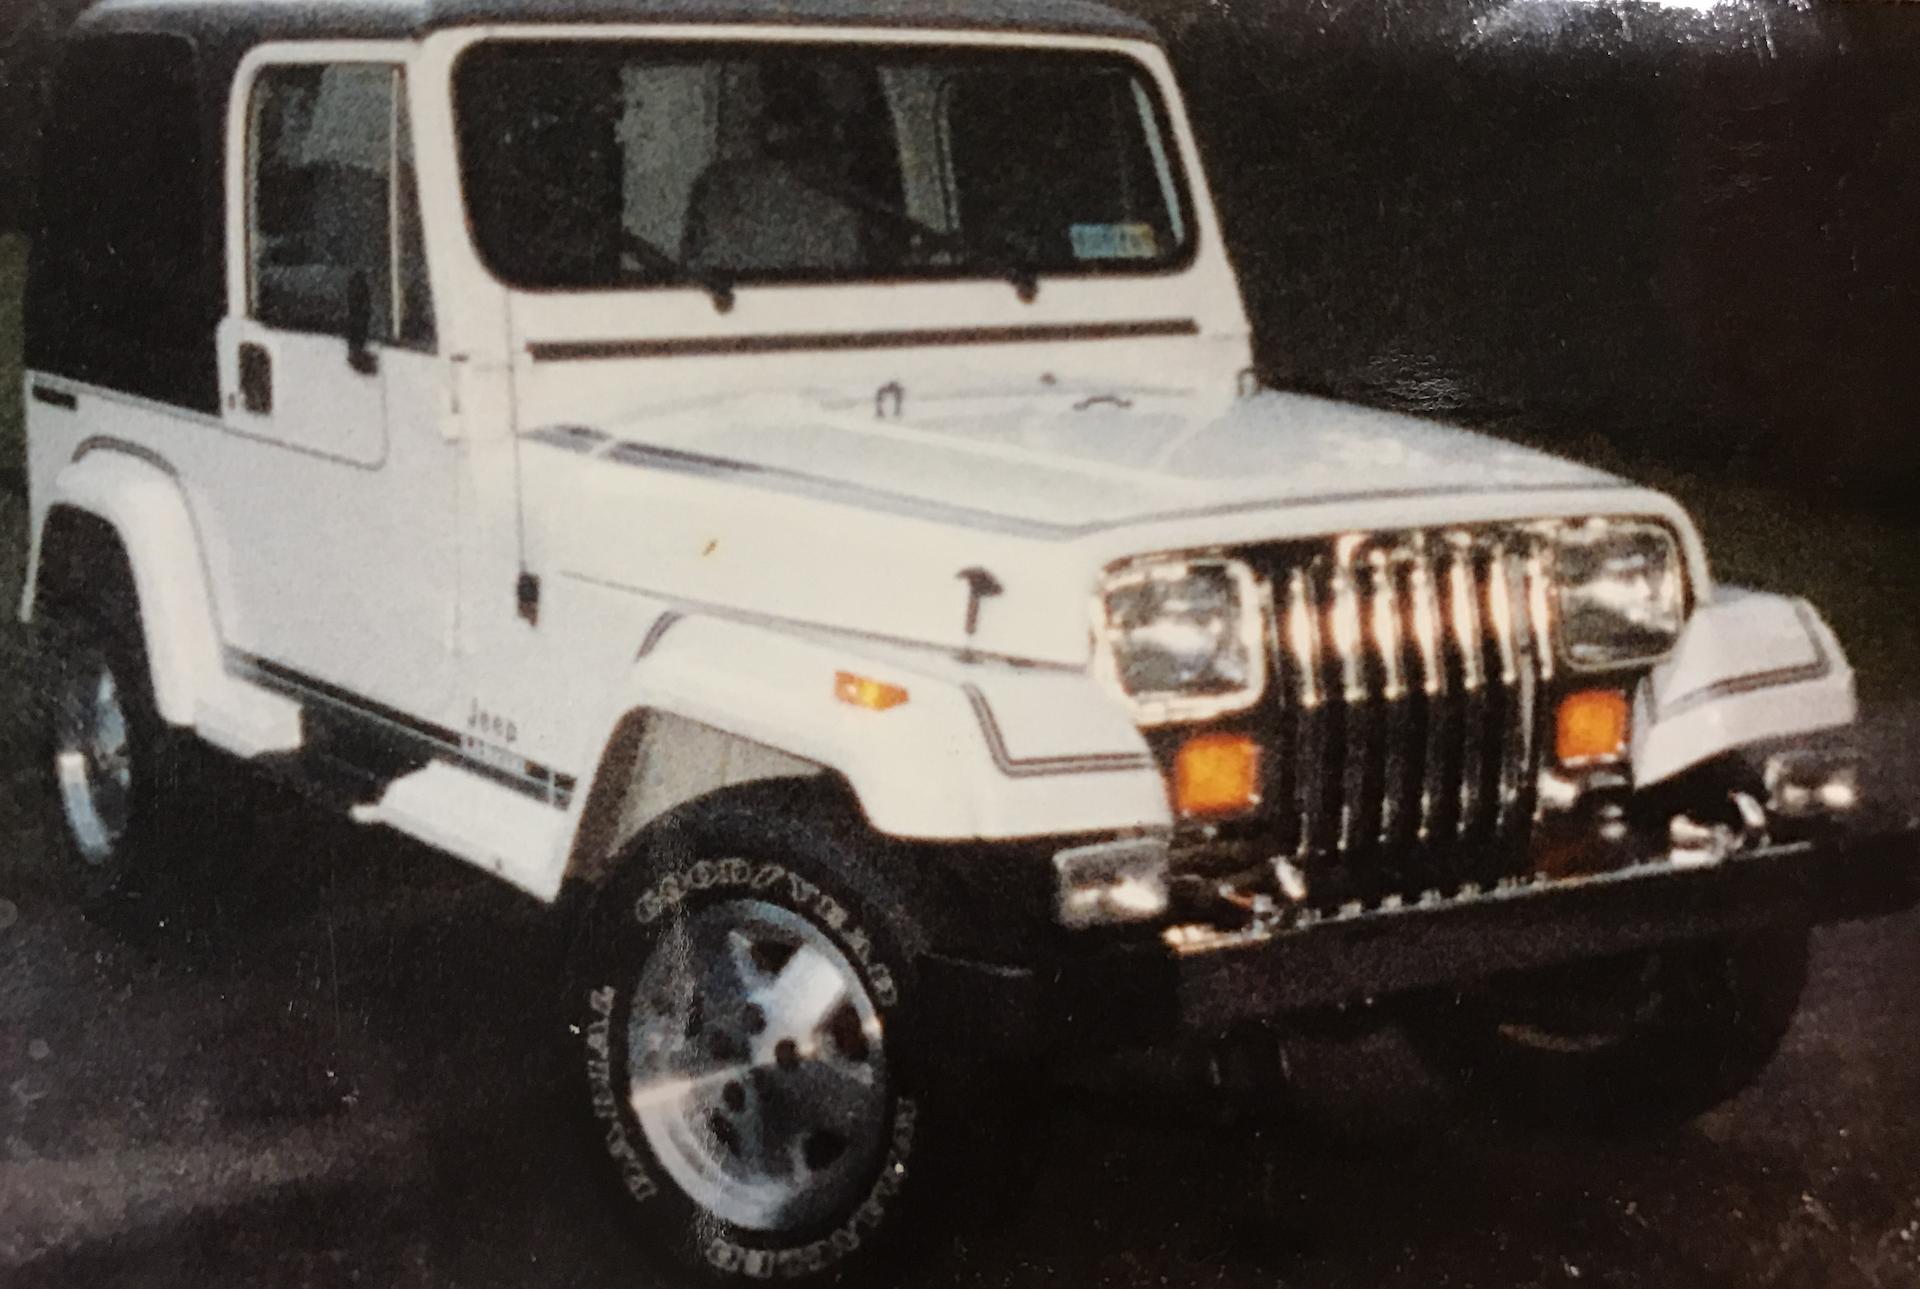 Mikes Jeeps 07 Jk 78 Cj 5 70 91 Wrangler 84 Xj Arb 1988 Jeep Hard Top Lockers Holley Pro Jection Edelbrock Manifold Bds Warn Winch